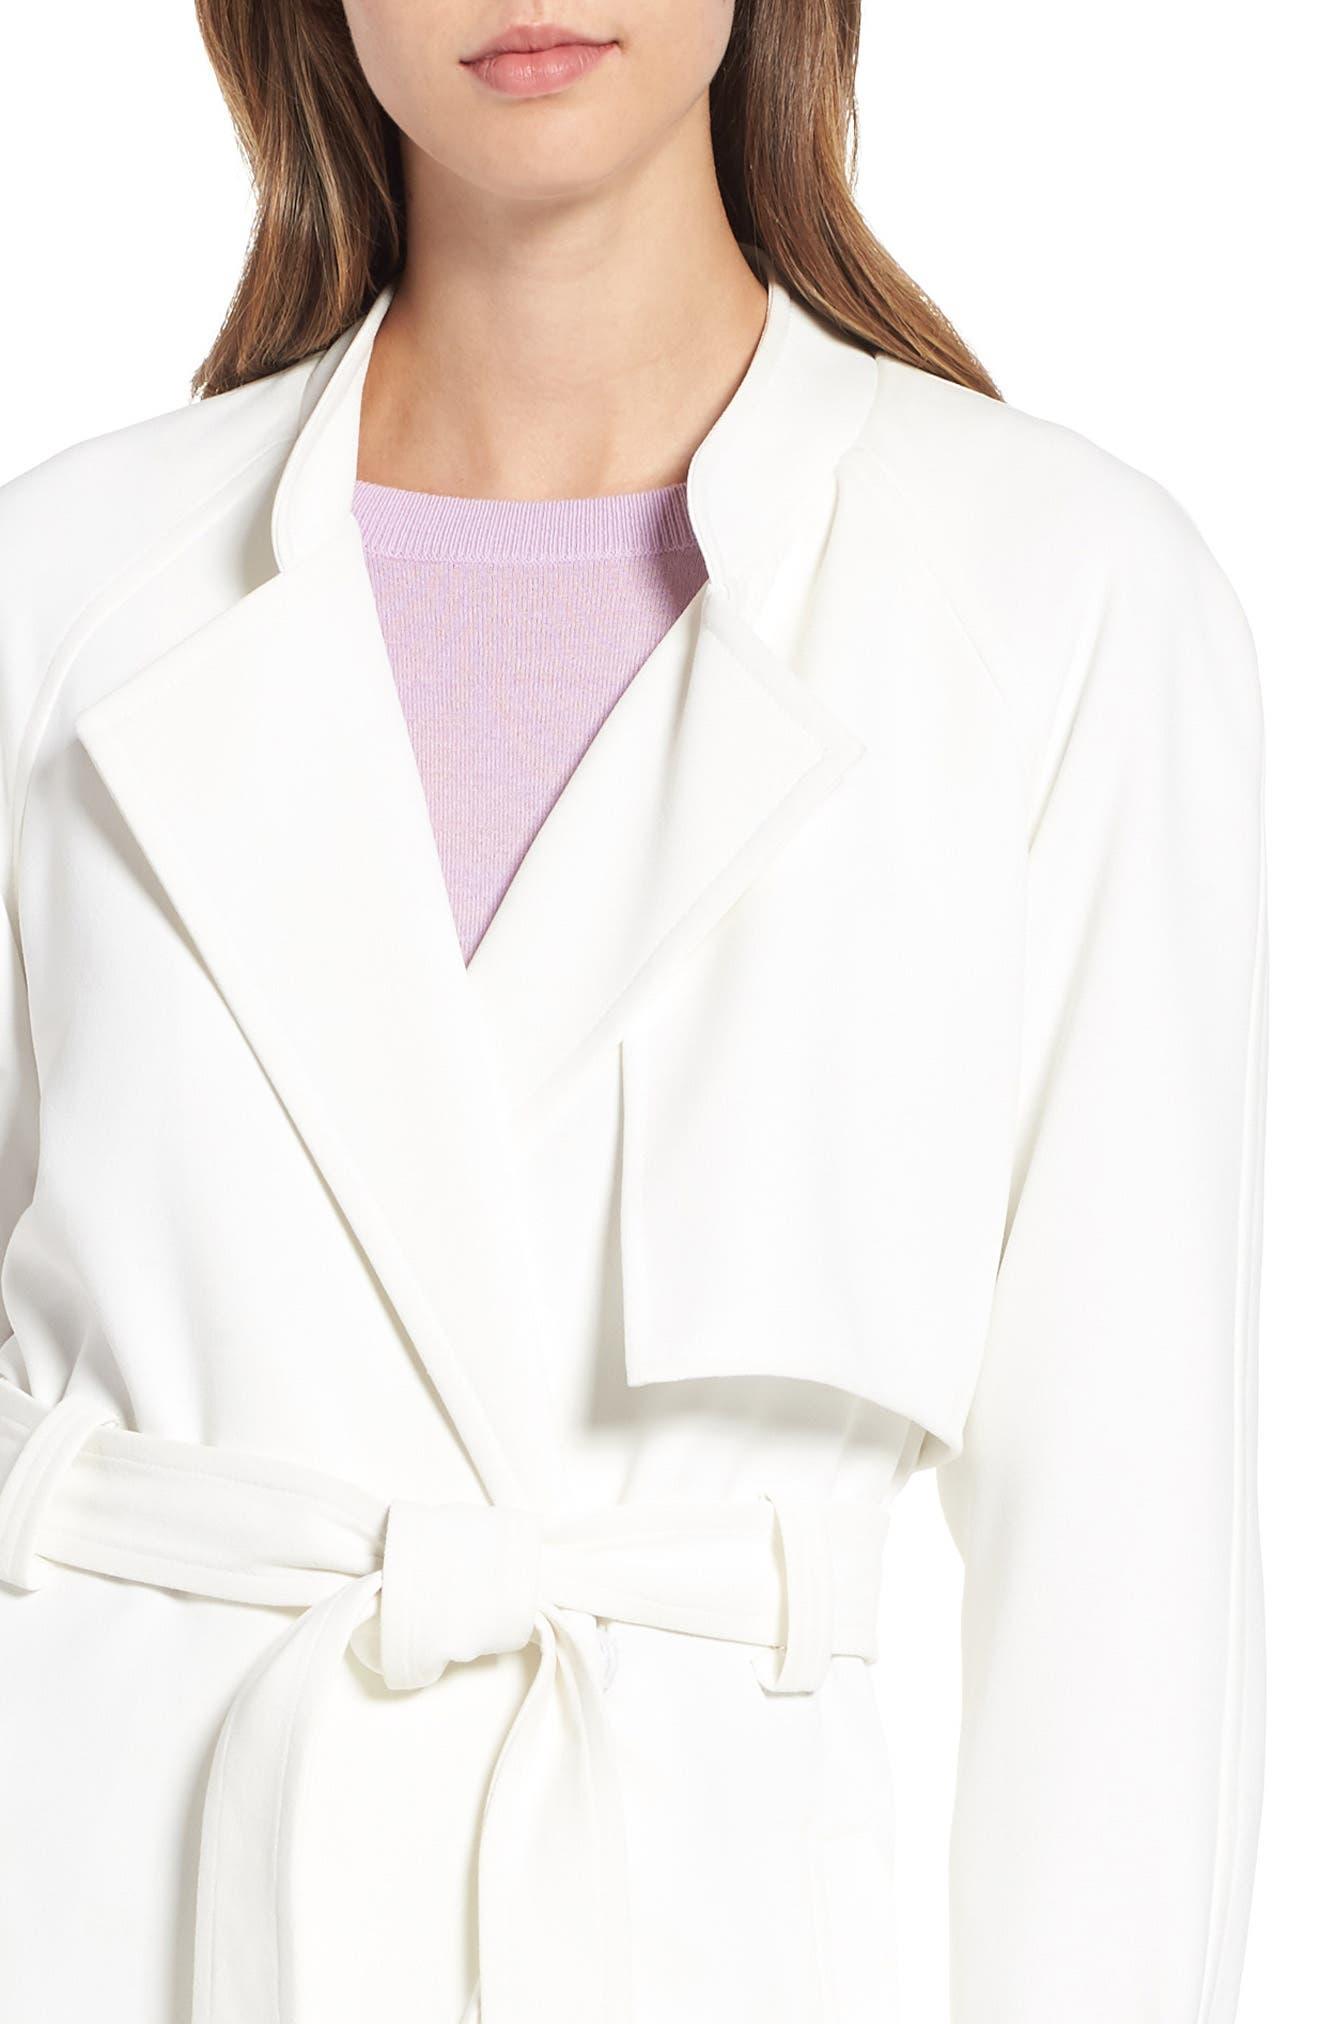 RACHEL RACHEL ROY, Luxe Crepe Trench Coat, Alternate thumbnail 4, color, WHITE